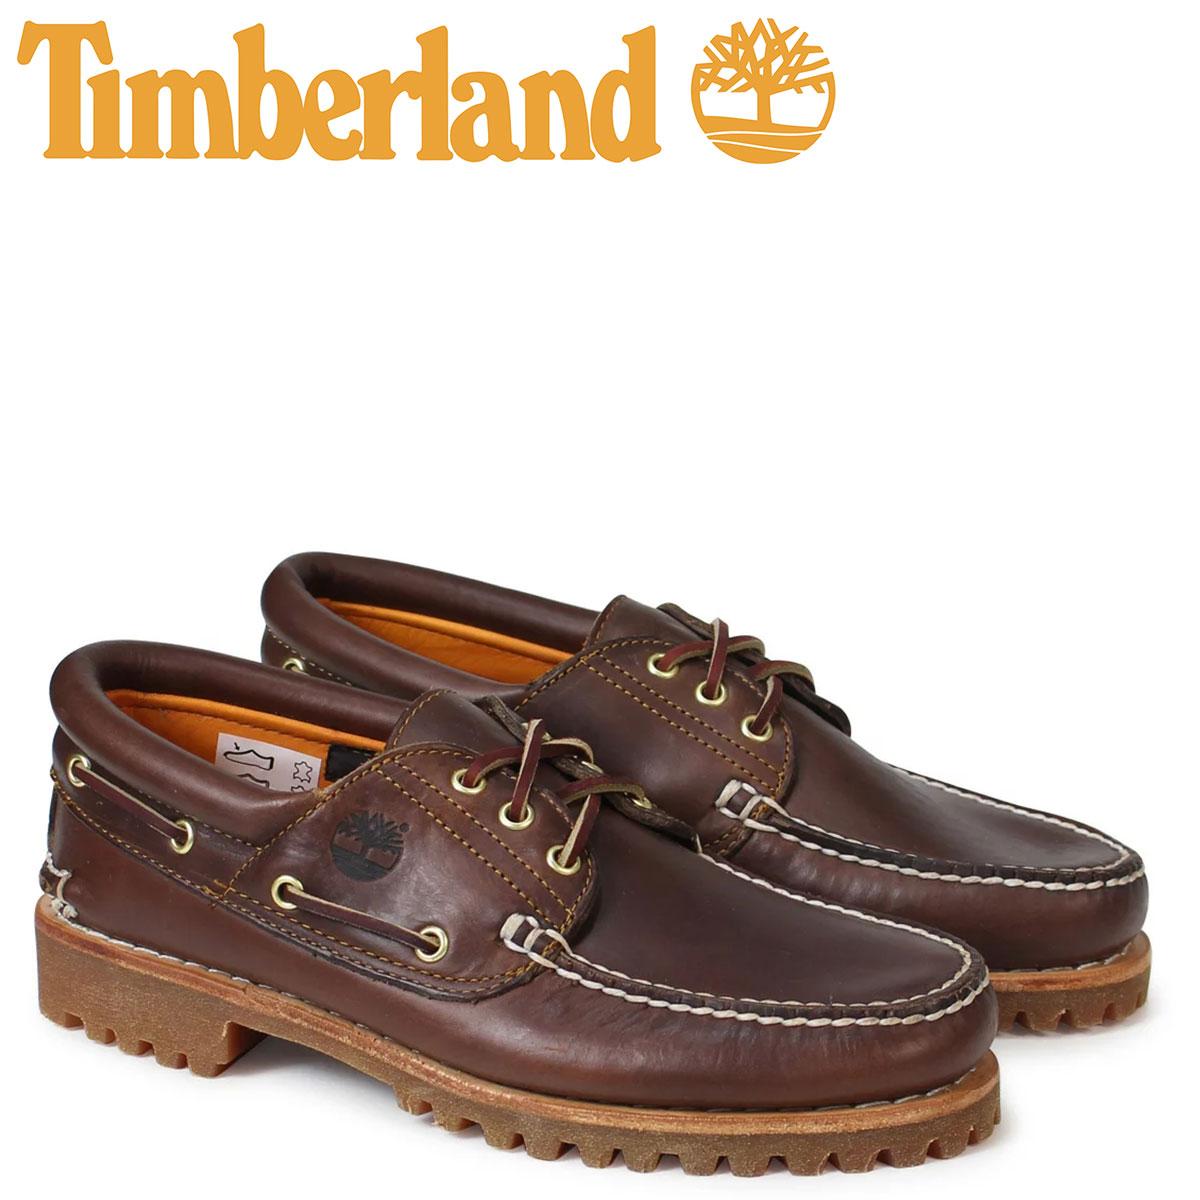 Timberland デッキシューズ メンズ ティンバーランド HERITAGE 3 EYE CLASSIC LUG 30003 [3/16 再入荷]